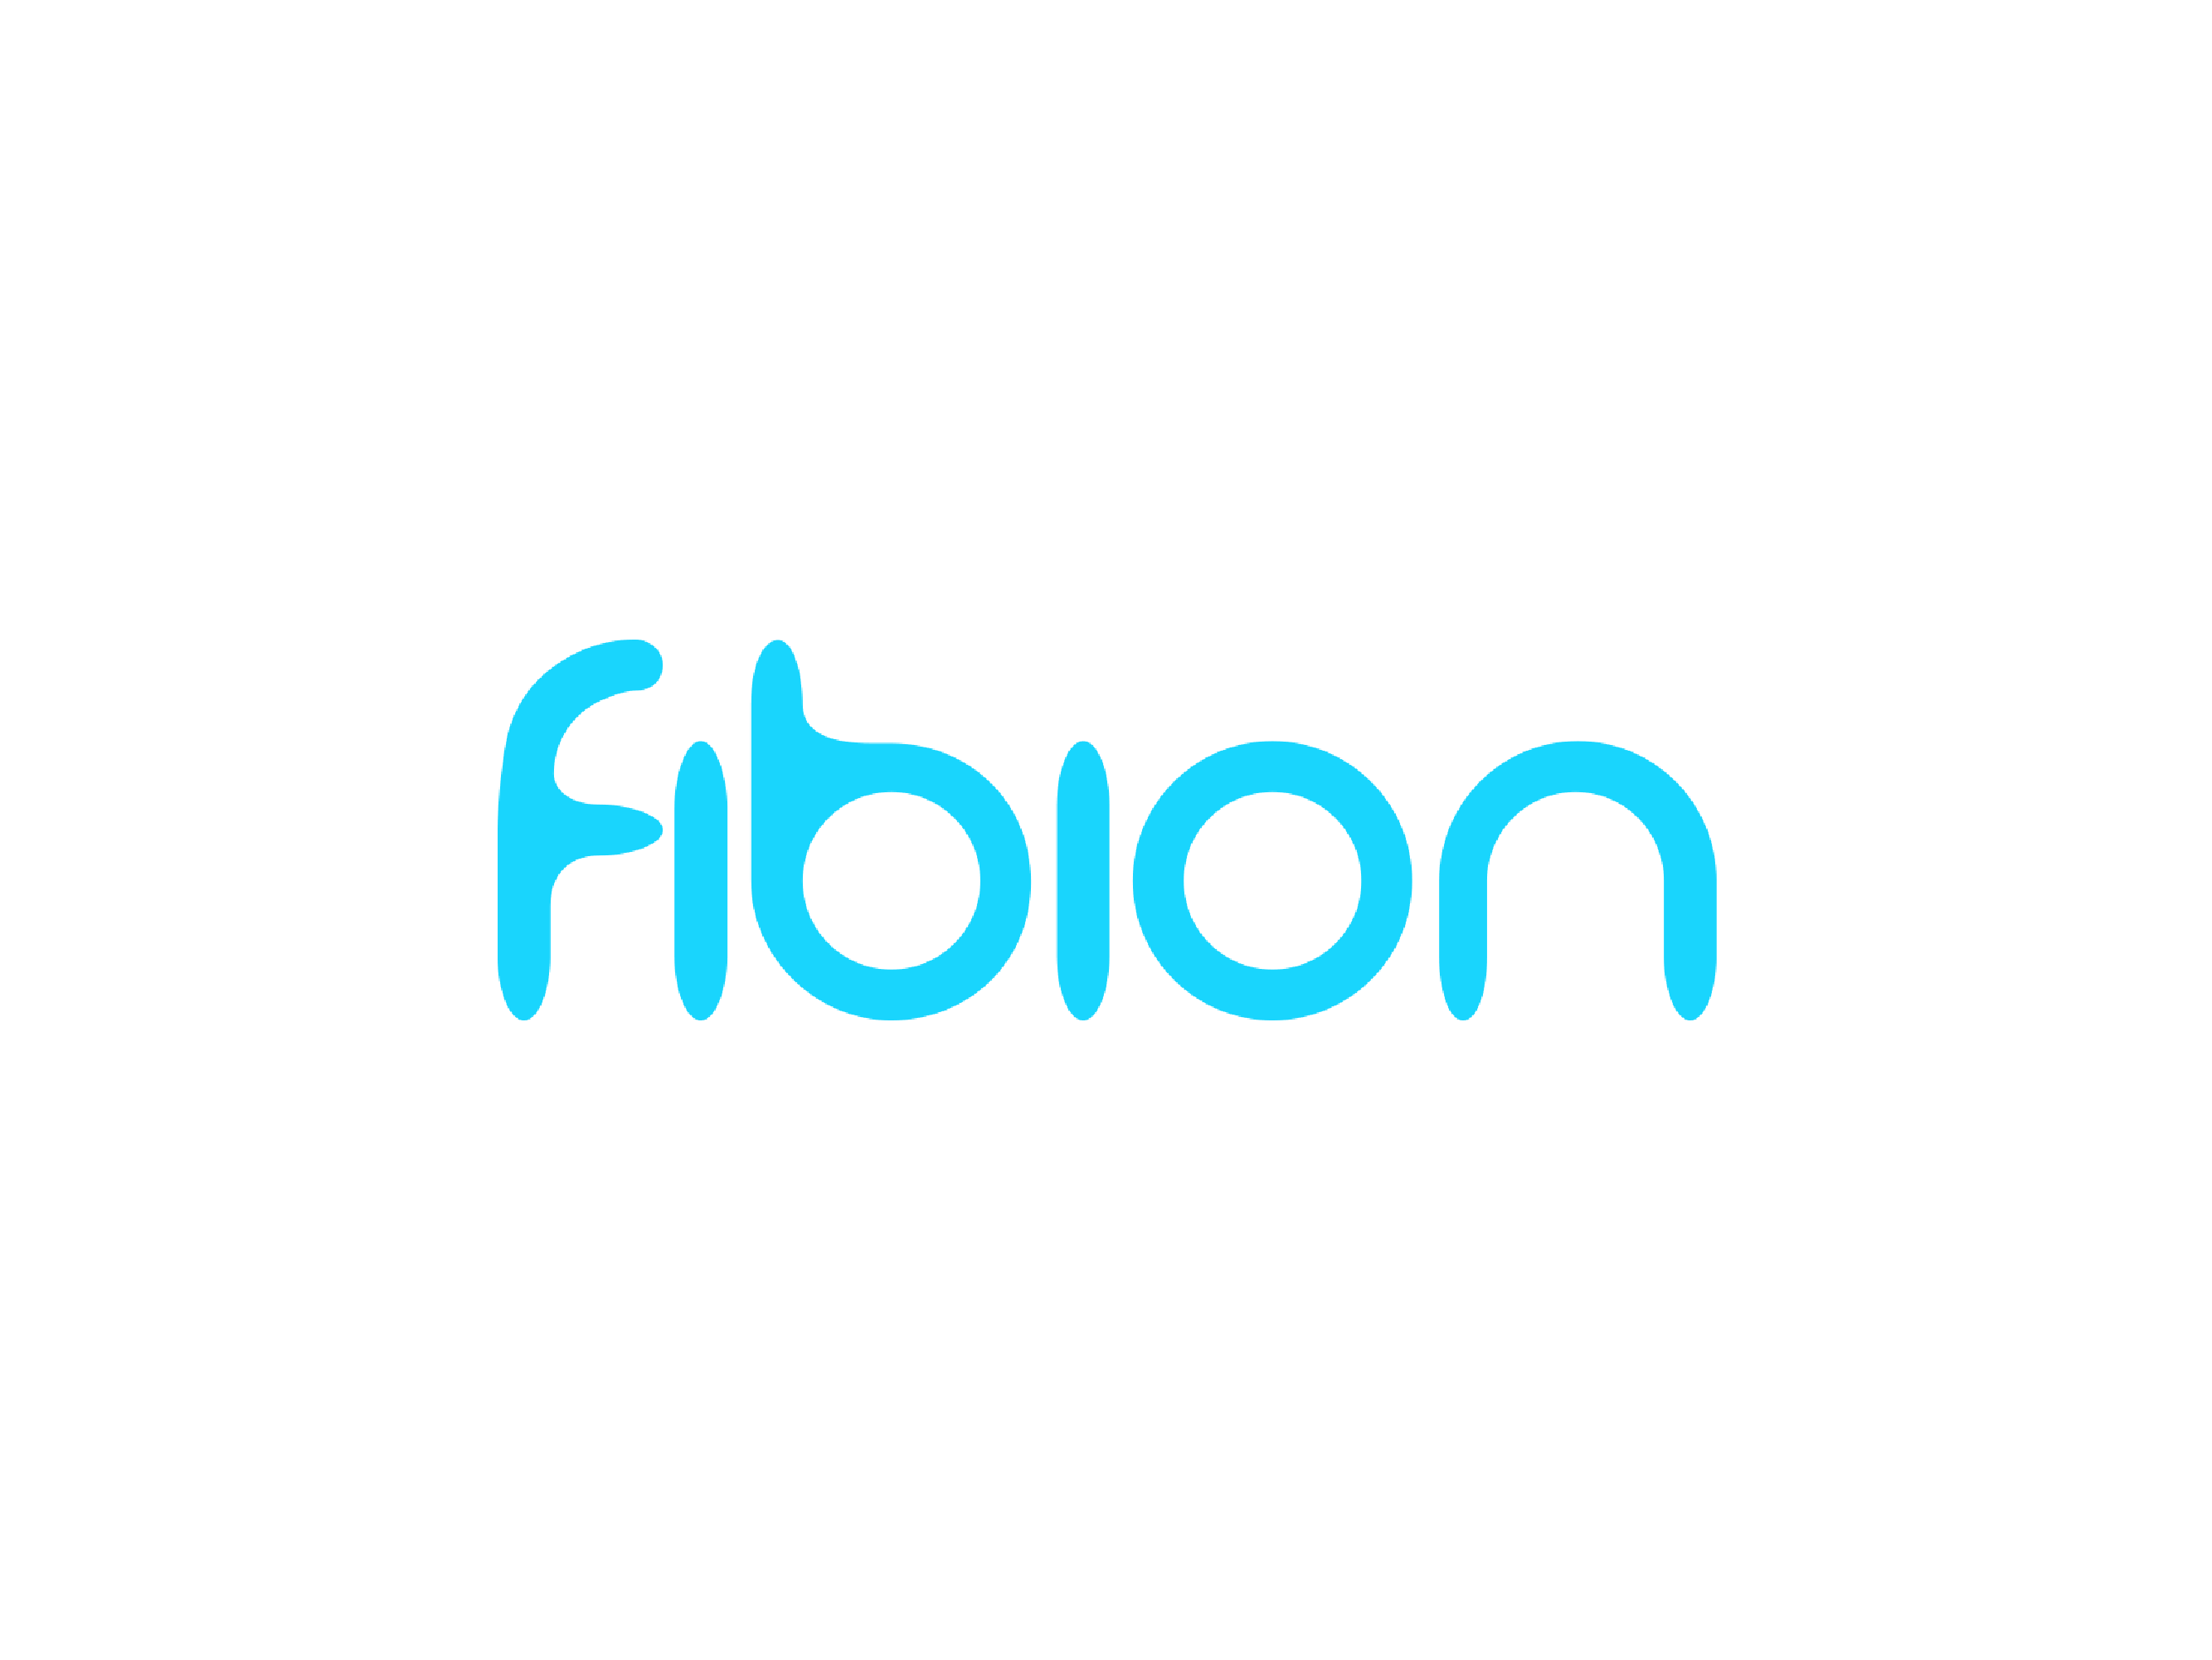 fibion-1-14